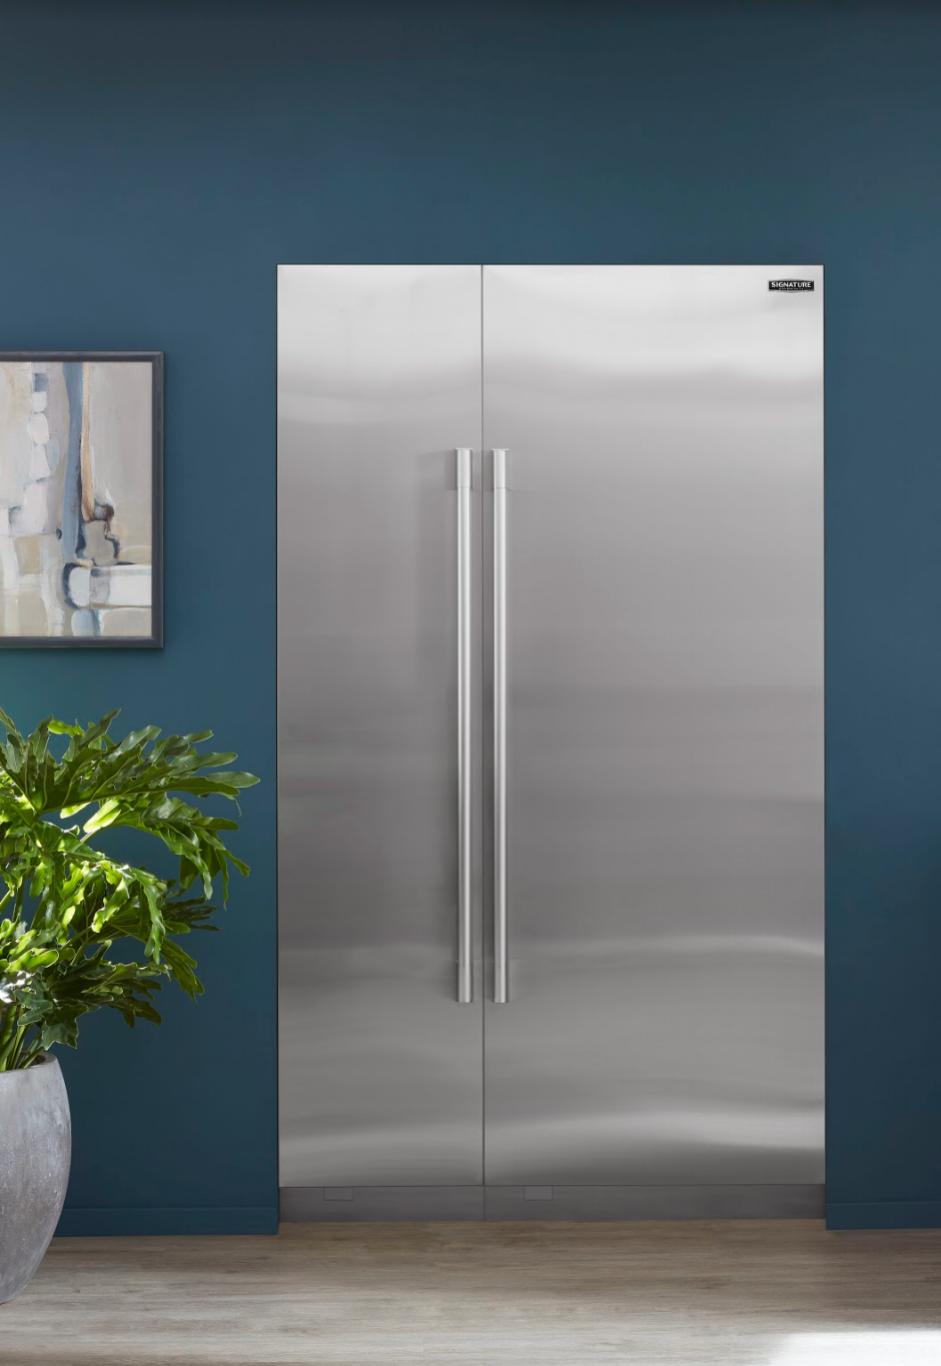 "Signature Kitchen Suite: Integrated Column 18"" Freezer and 30"" Refrigerator"